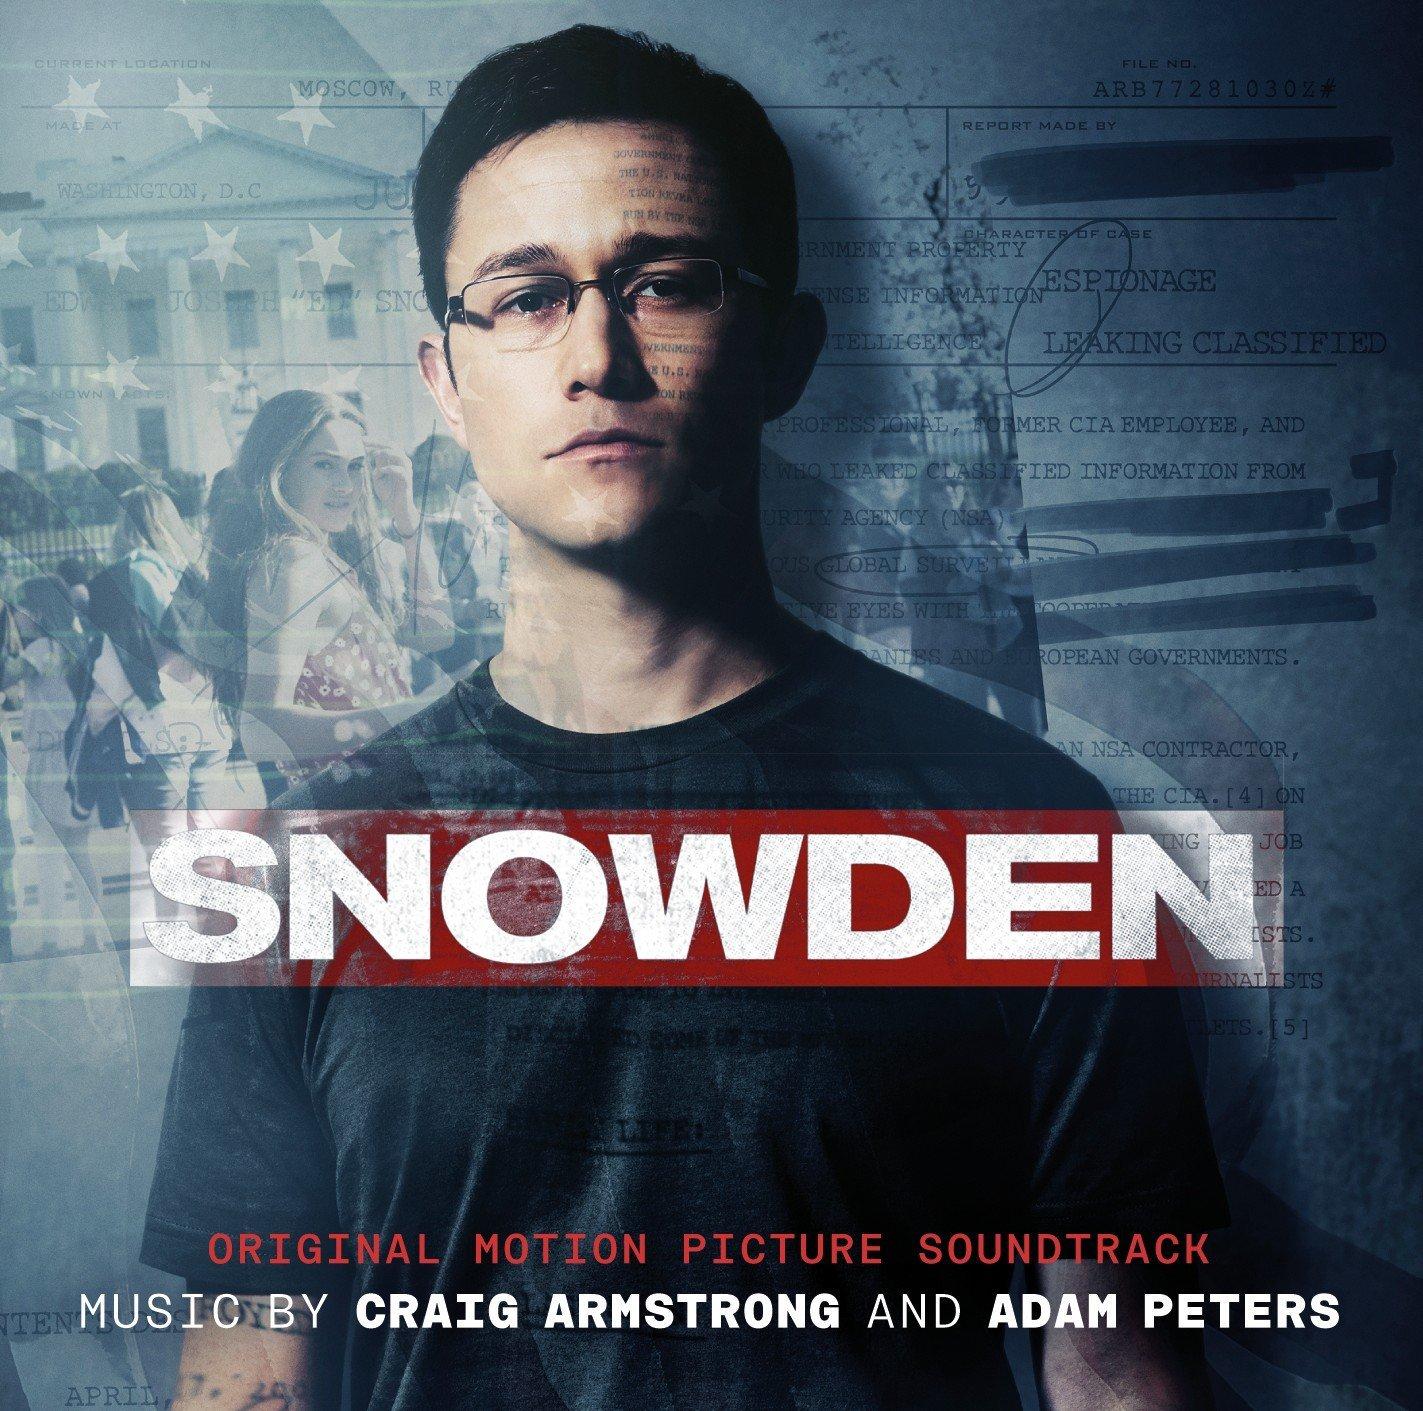 Snowden Movie Soundtrack